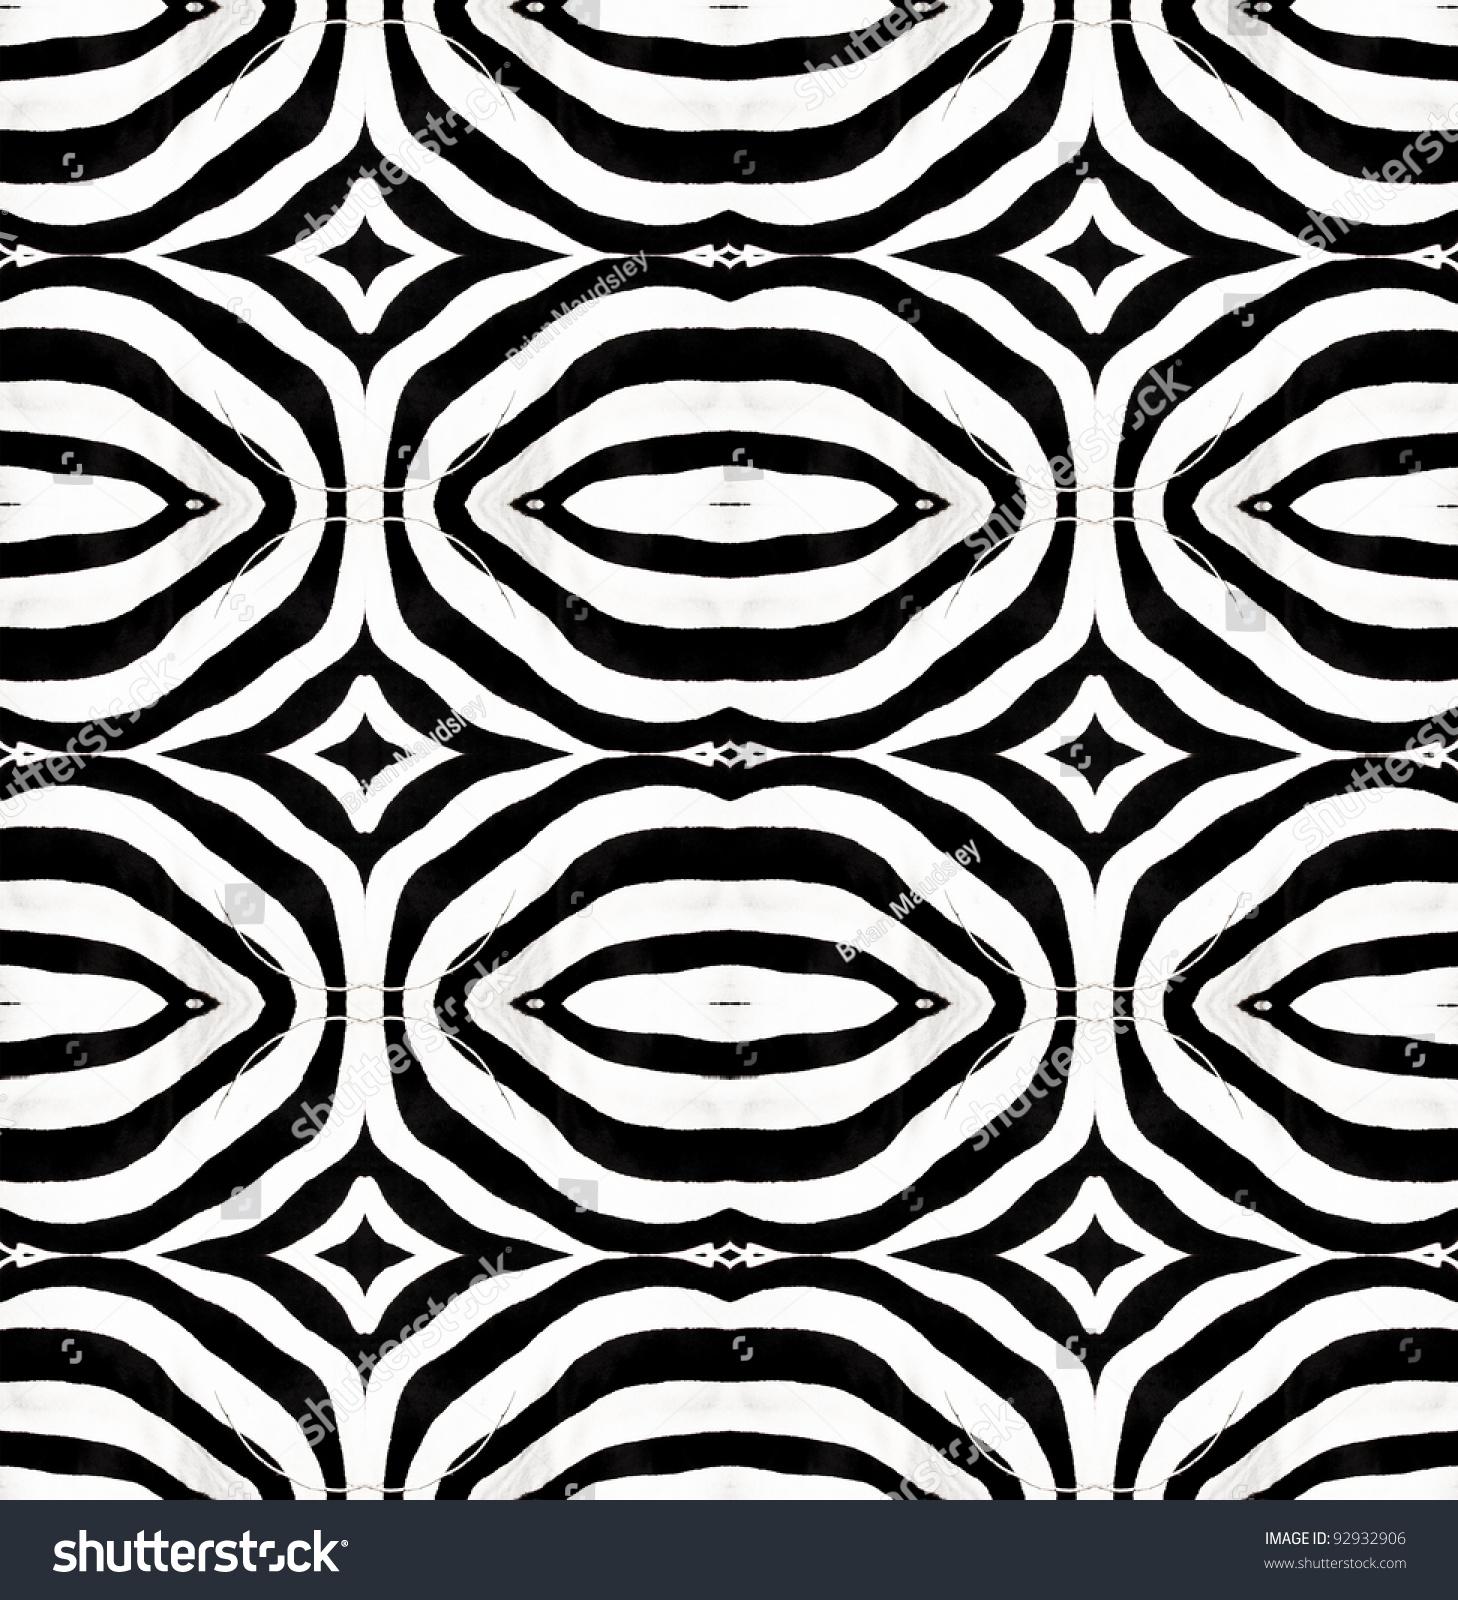 Real zebra pattern - photo#16